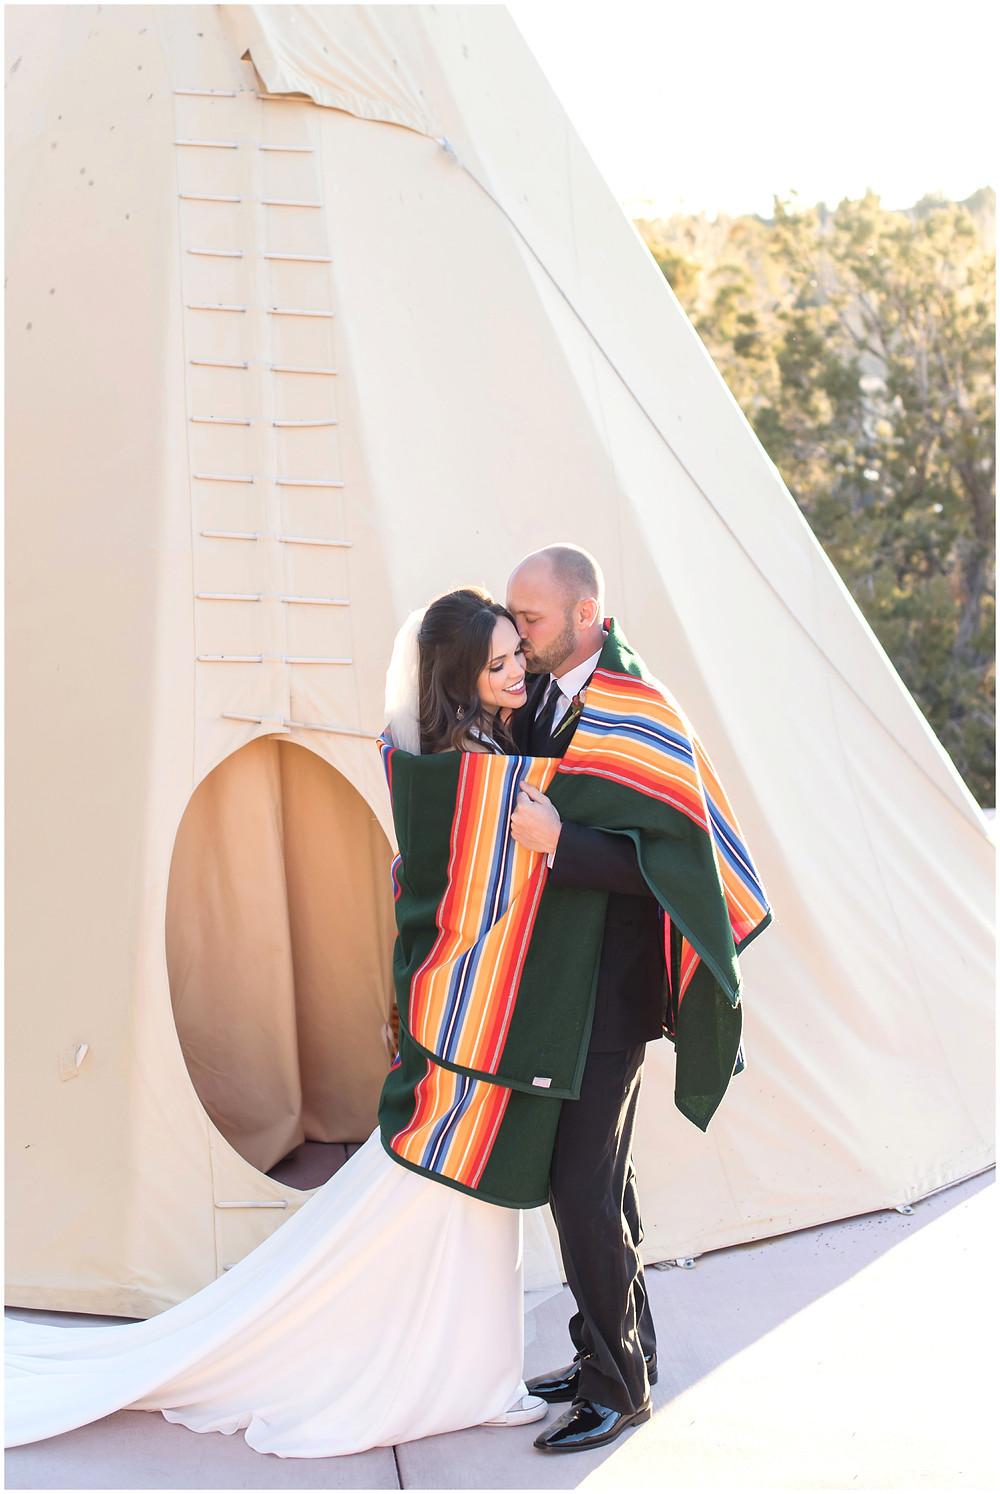 Winter Wedding New Mexico. New Mexico Wedding Photographer. Four Seasons Santa Fe Wedding.